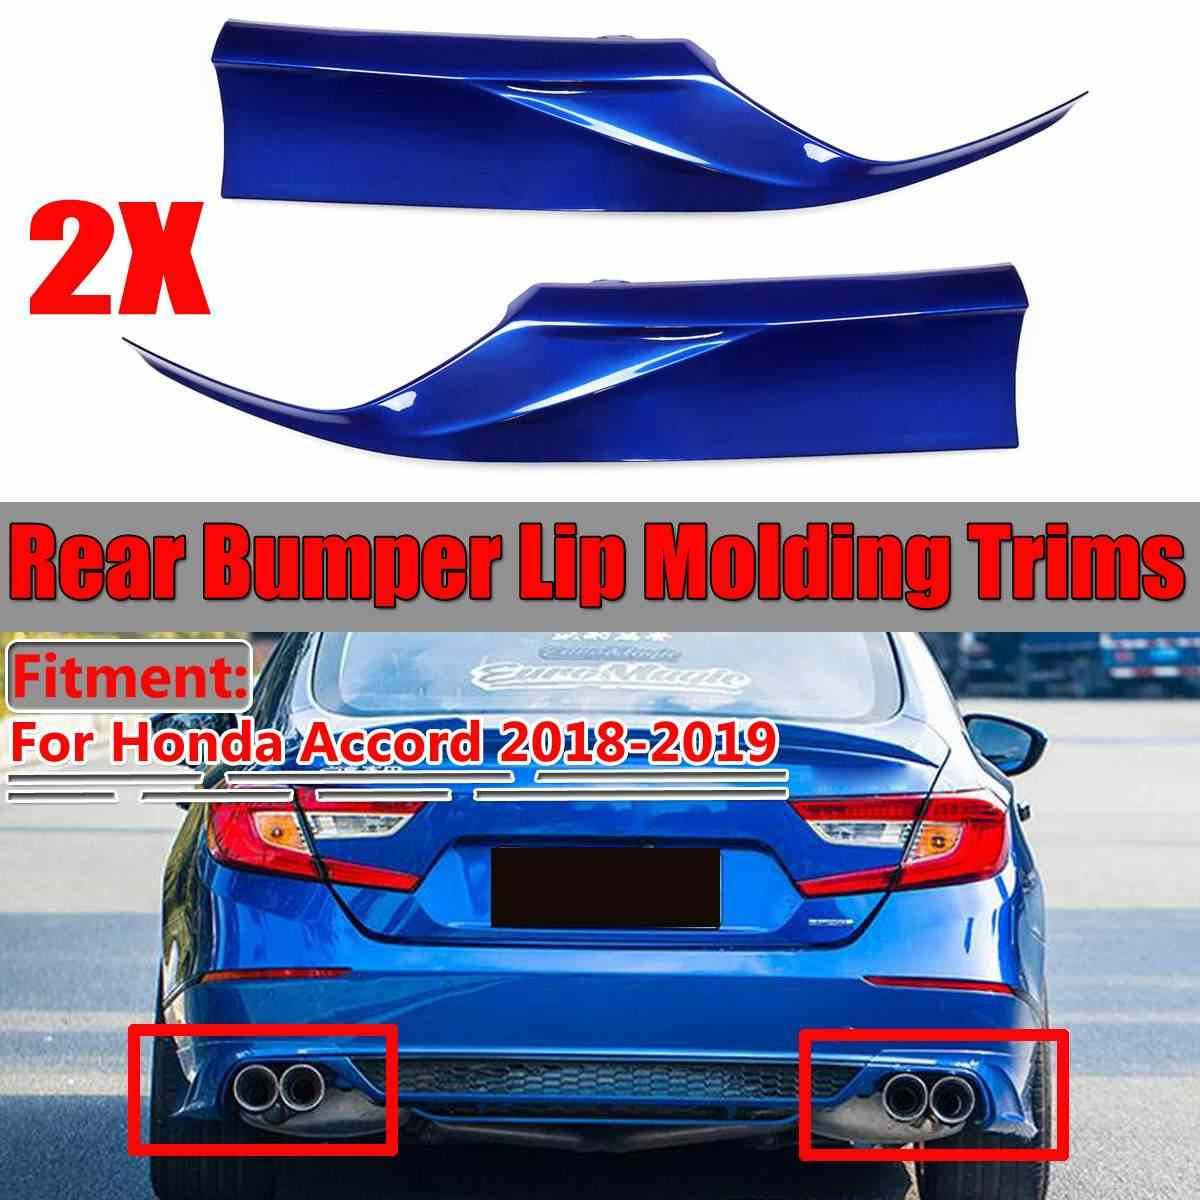 For 2018-2019 Accord Rear Bumper Lip Splitter Spoiler Side Aprons Molding Trims